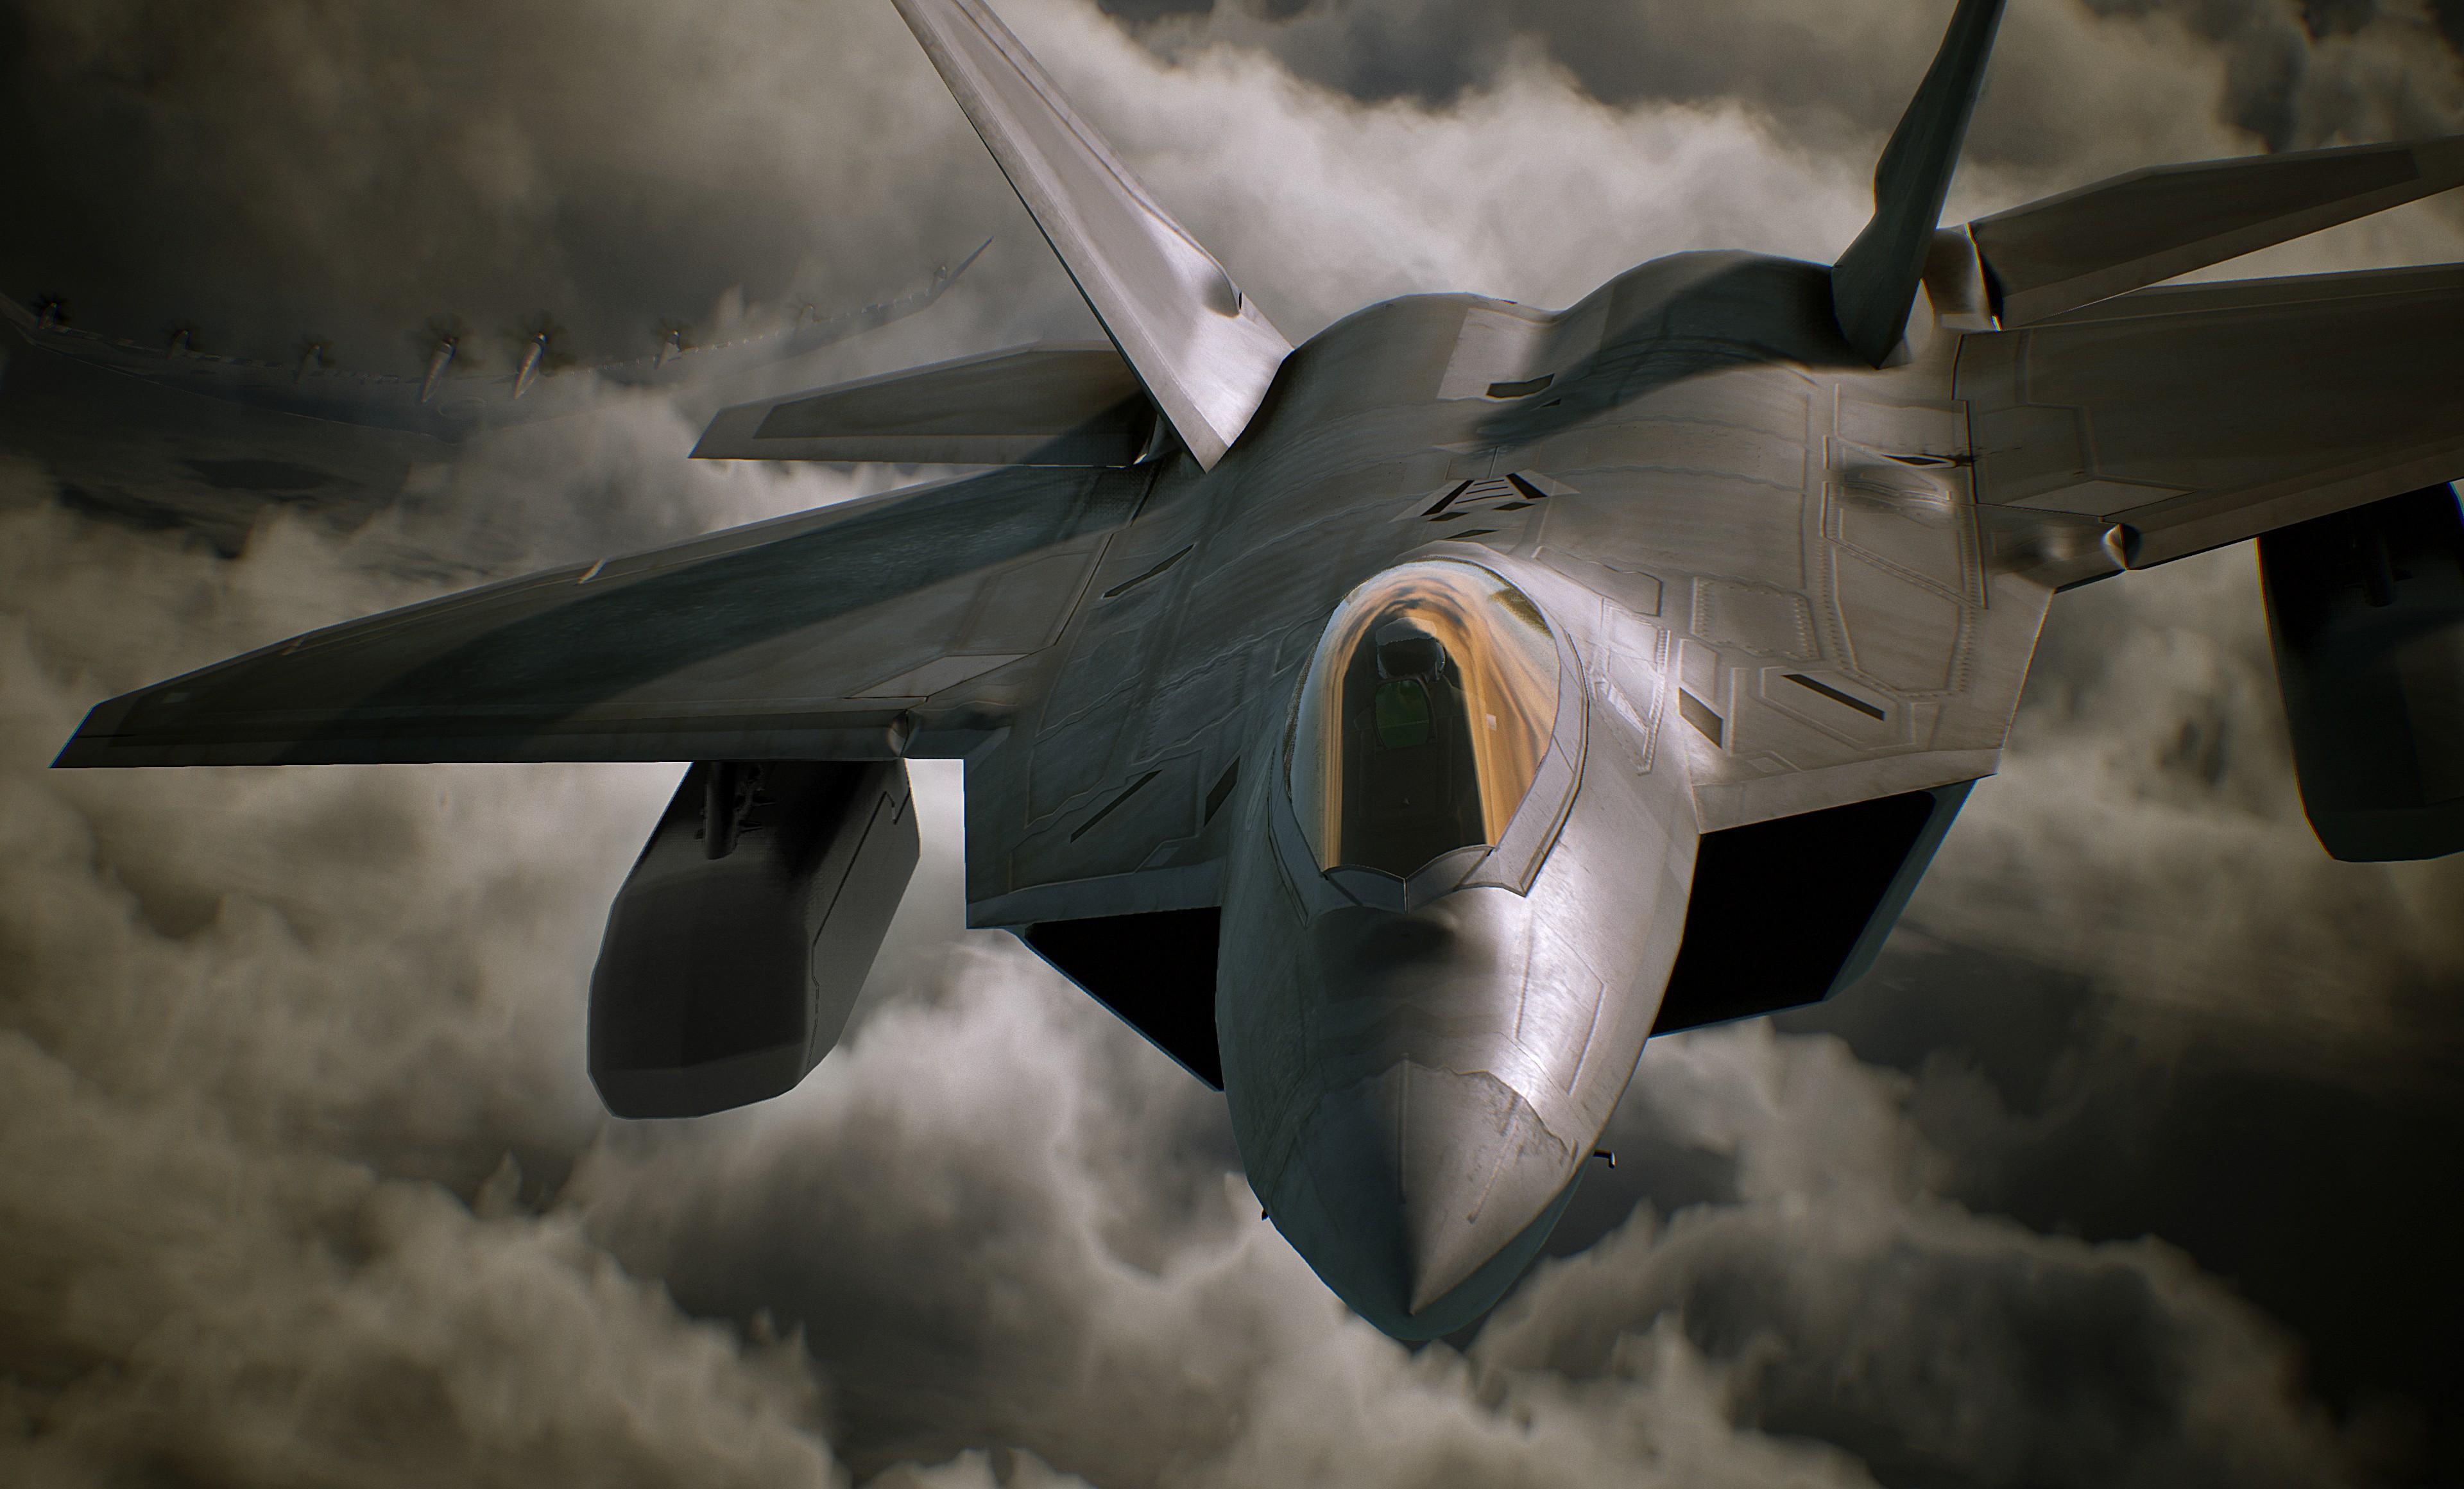 Ace Combat 7: Skies Unknown - Ace Combat 7: Skies Unknown 4K, Скриншот